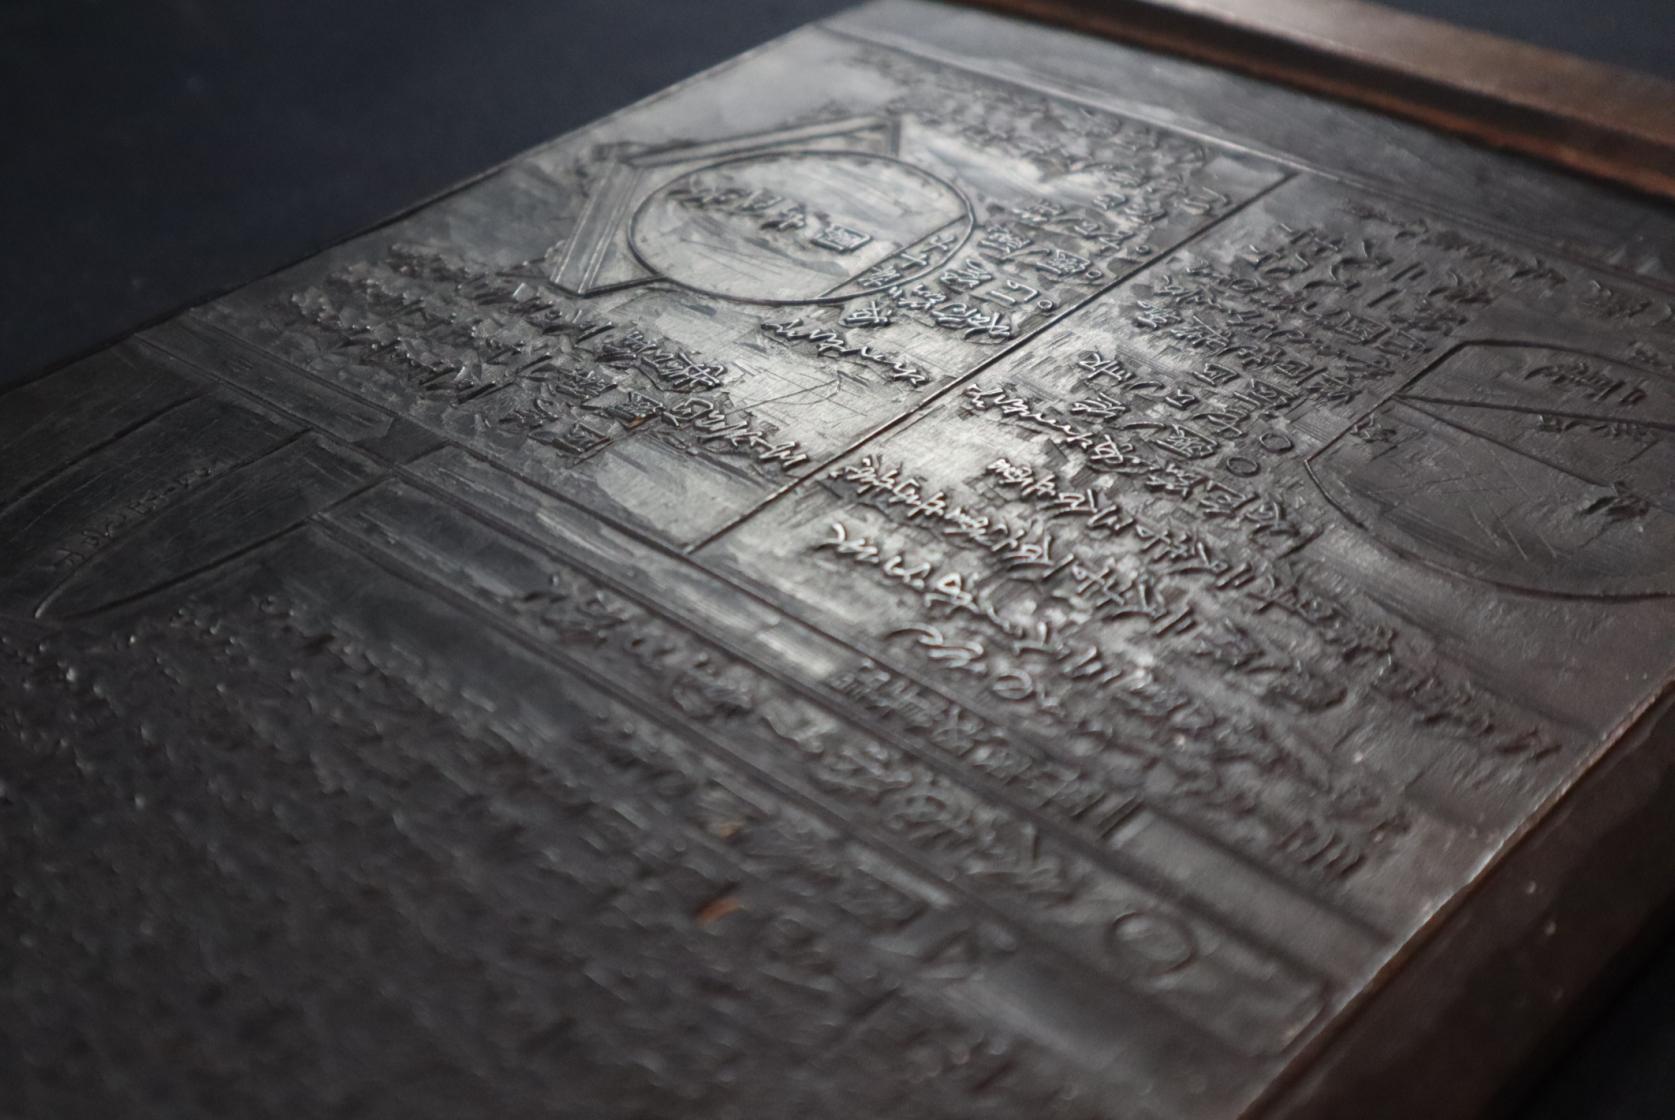 A woodblock for the printing of a Japanese Mathematical work, Saikoku Kaisanki